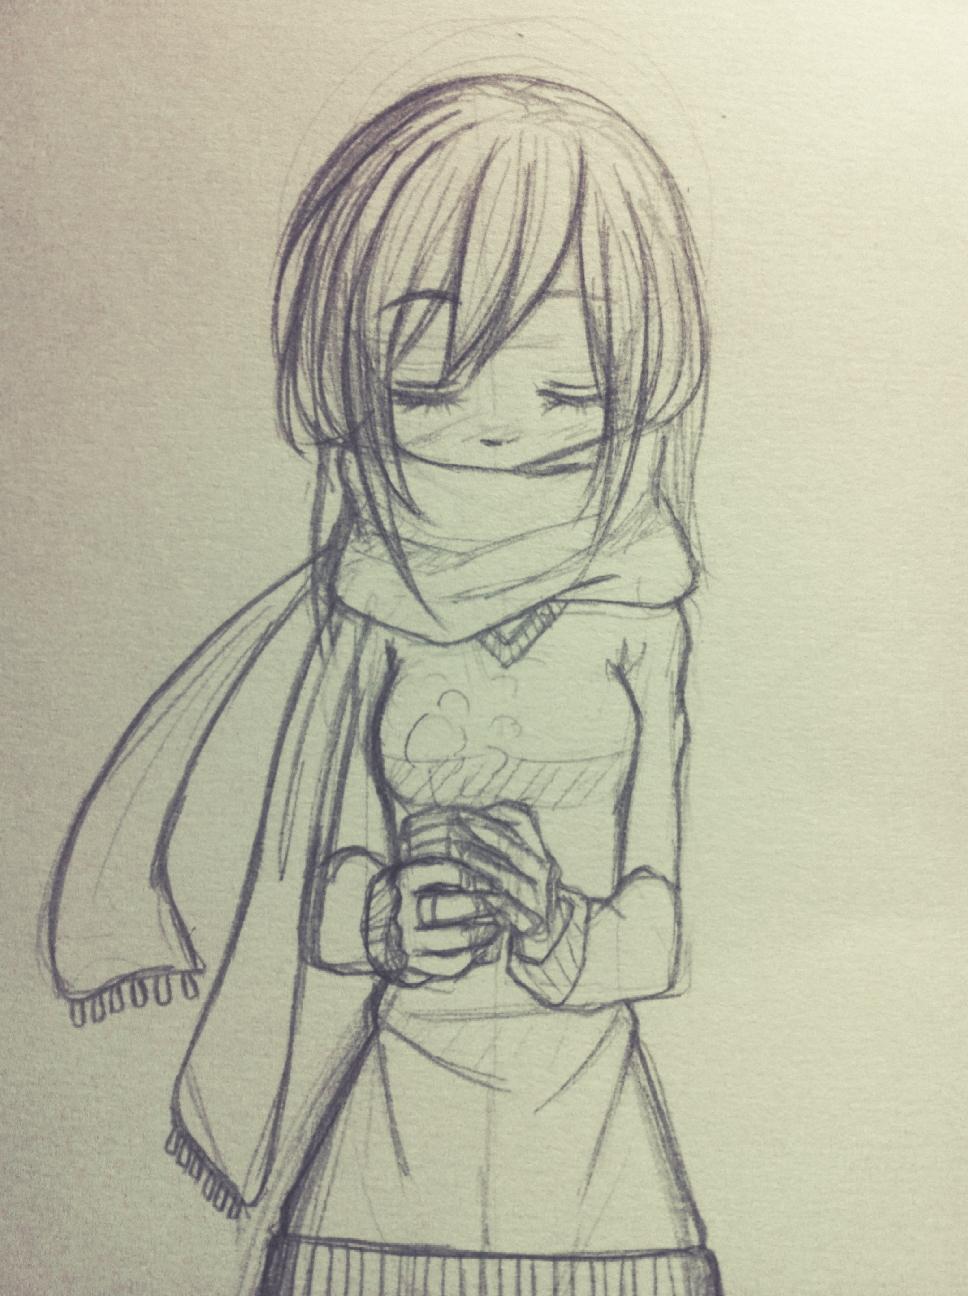 Drawn scarf anime  like so a wearing